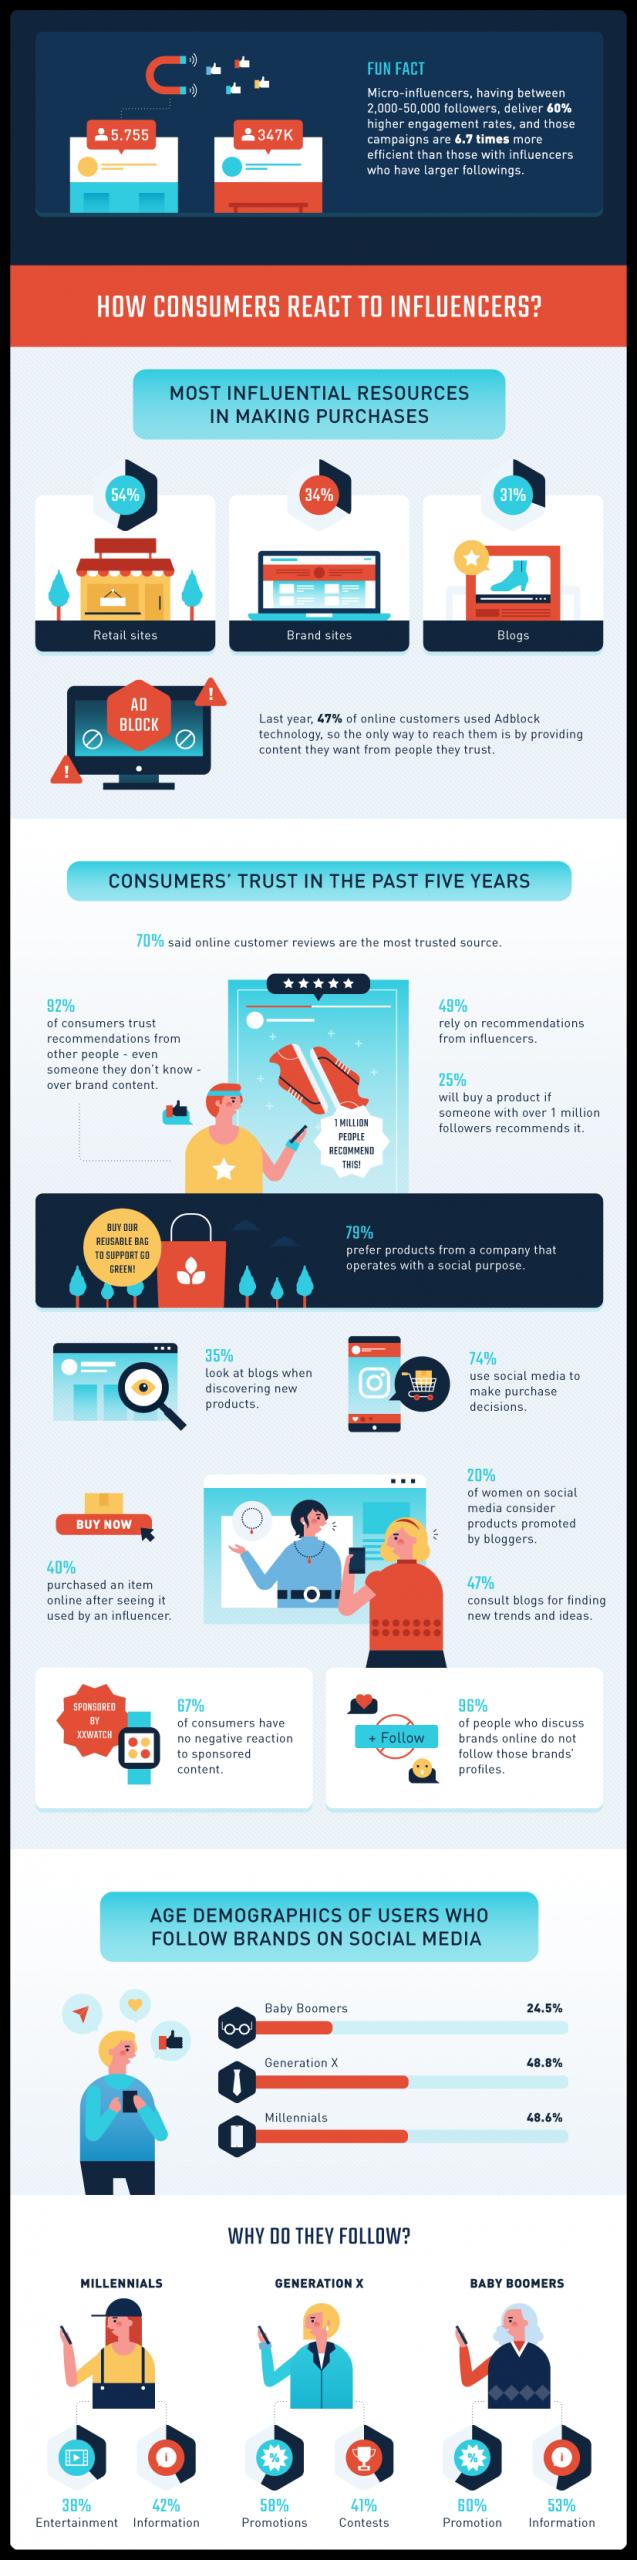 https://www.smallbizgenius.net/by-the-numbers/influencer-marketing-statistics/